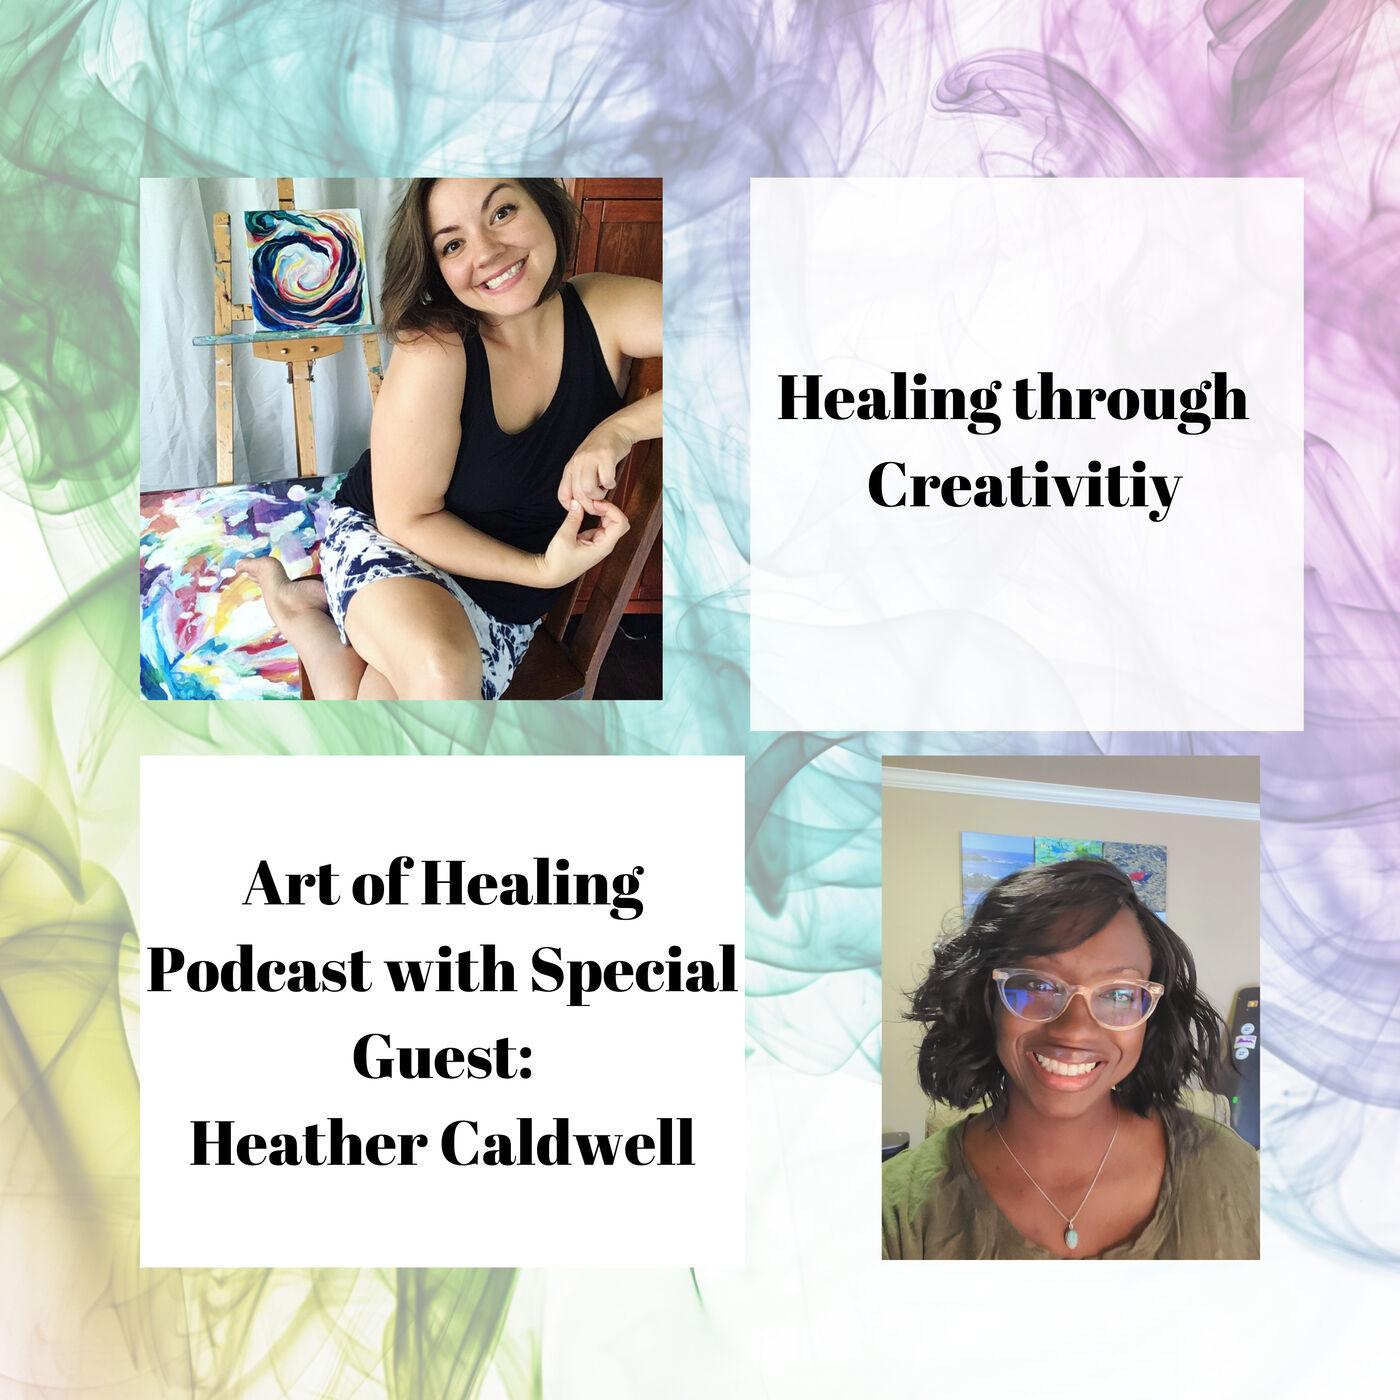 Healing through Creativity with Heather Caldwell of Heathyish